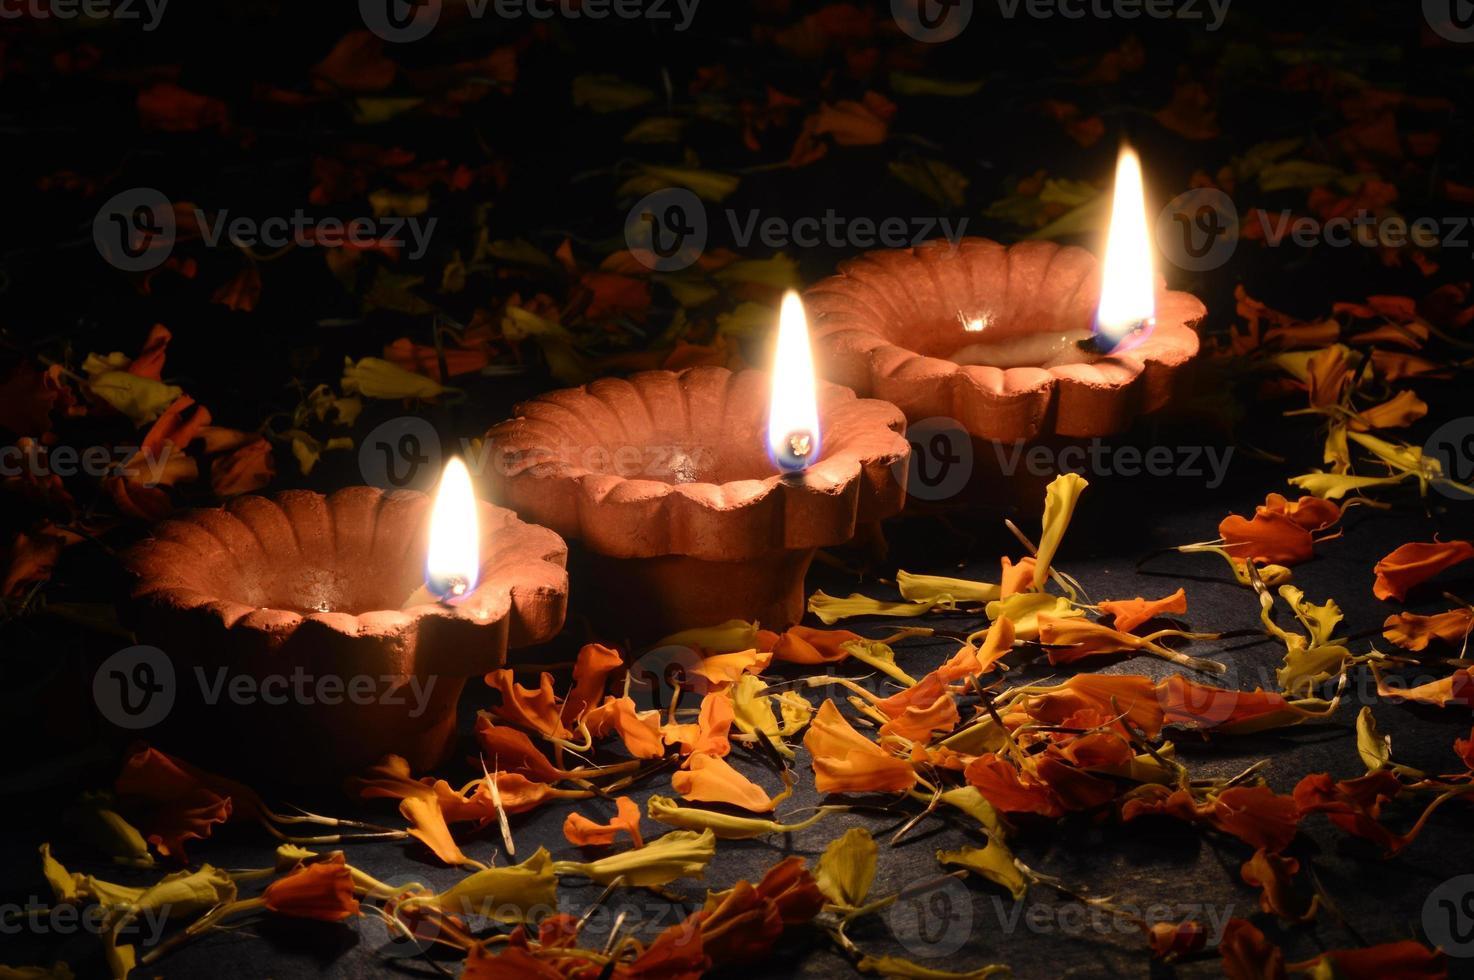 Clay diya lamps lit during diwali celebration. Greetings Card. photo